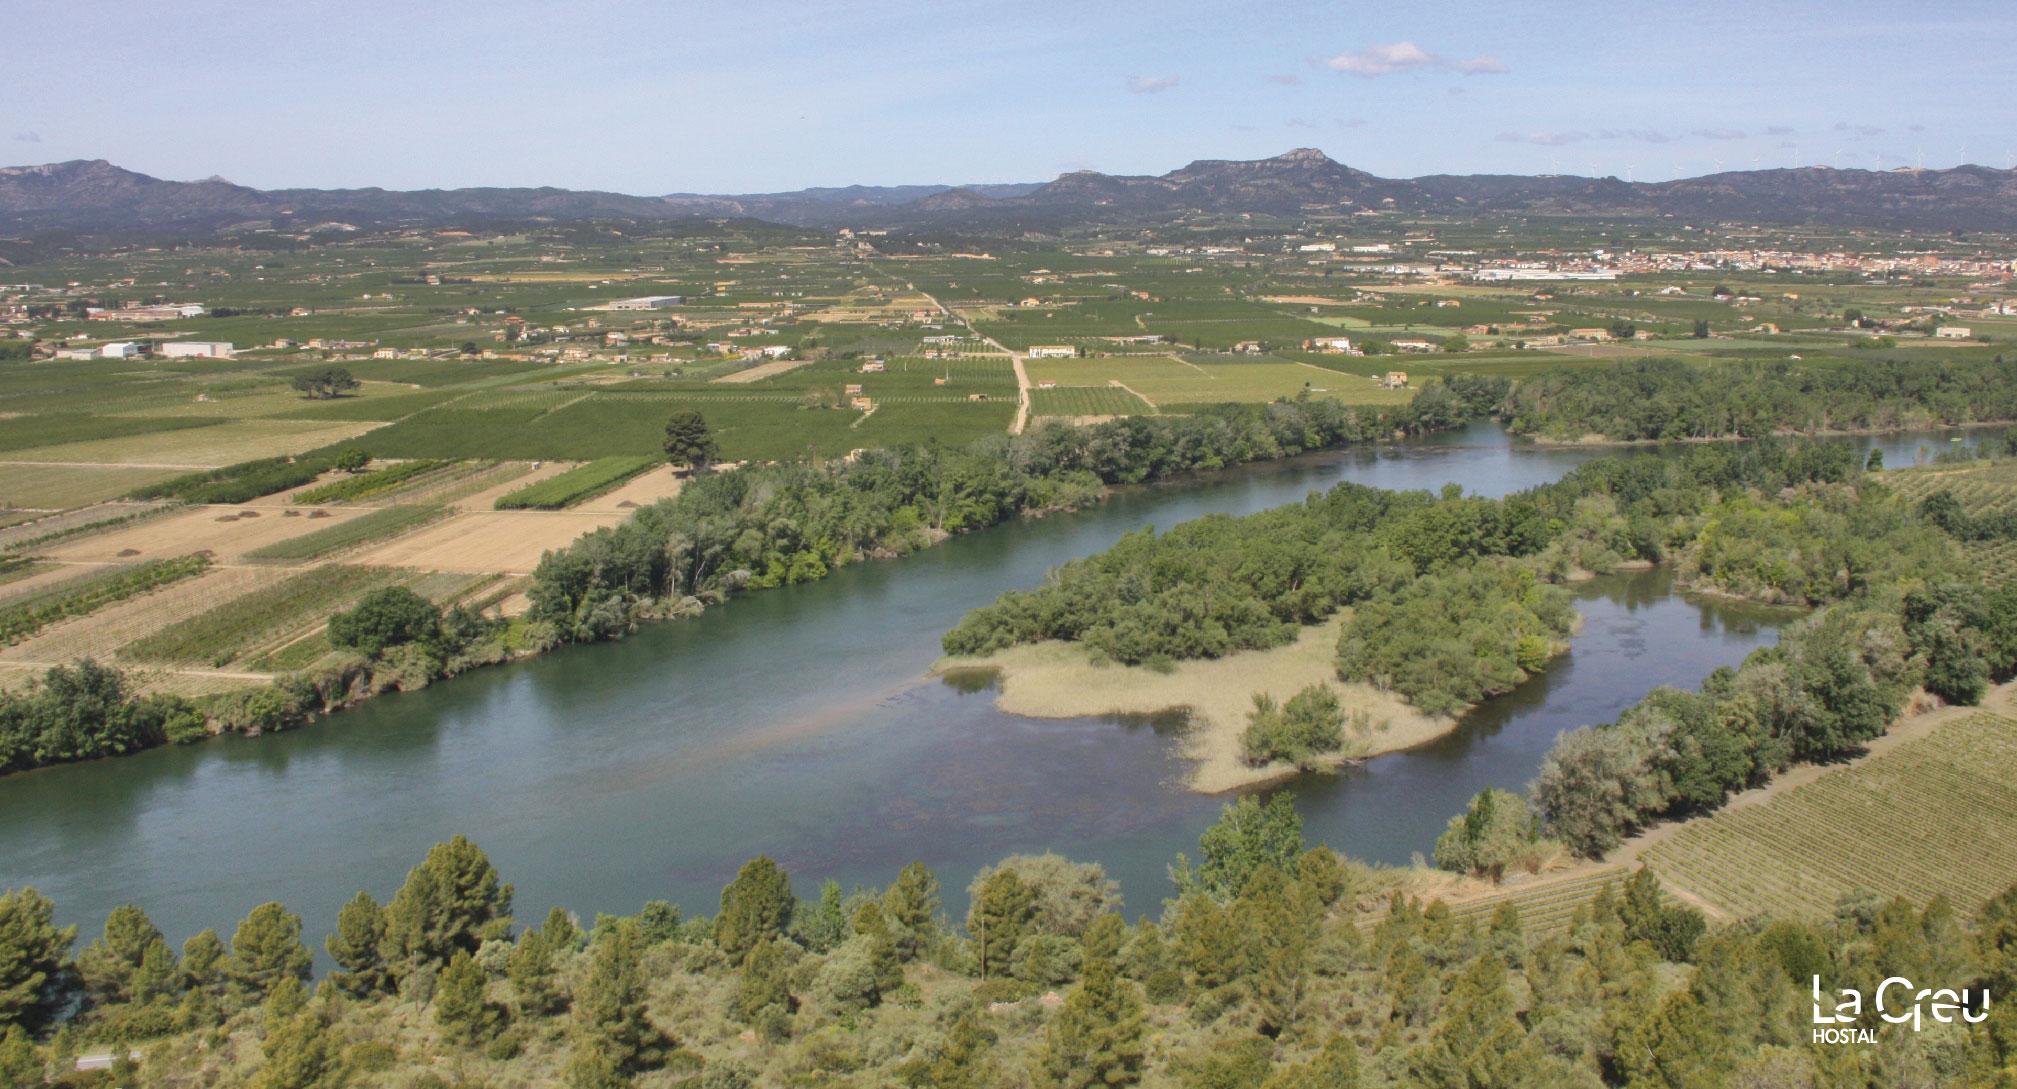 poblat-iberic-castellet-banyoles-tivissa-tarragona-ilercavons-turisme-terres-de-lebre-01-011-012-01